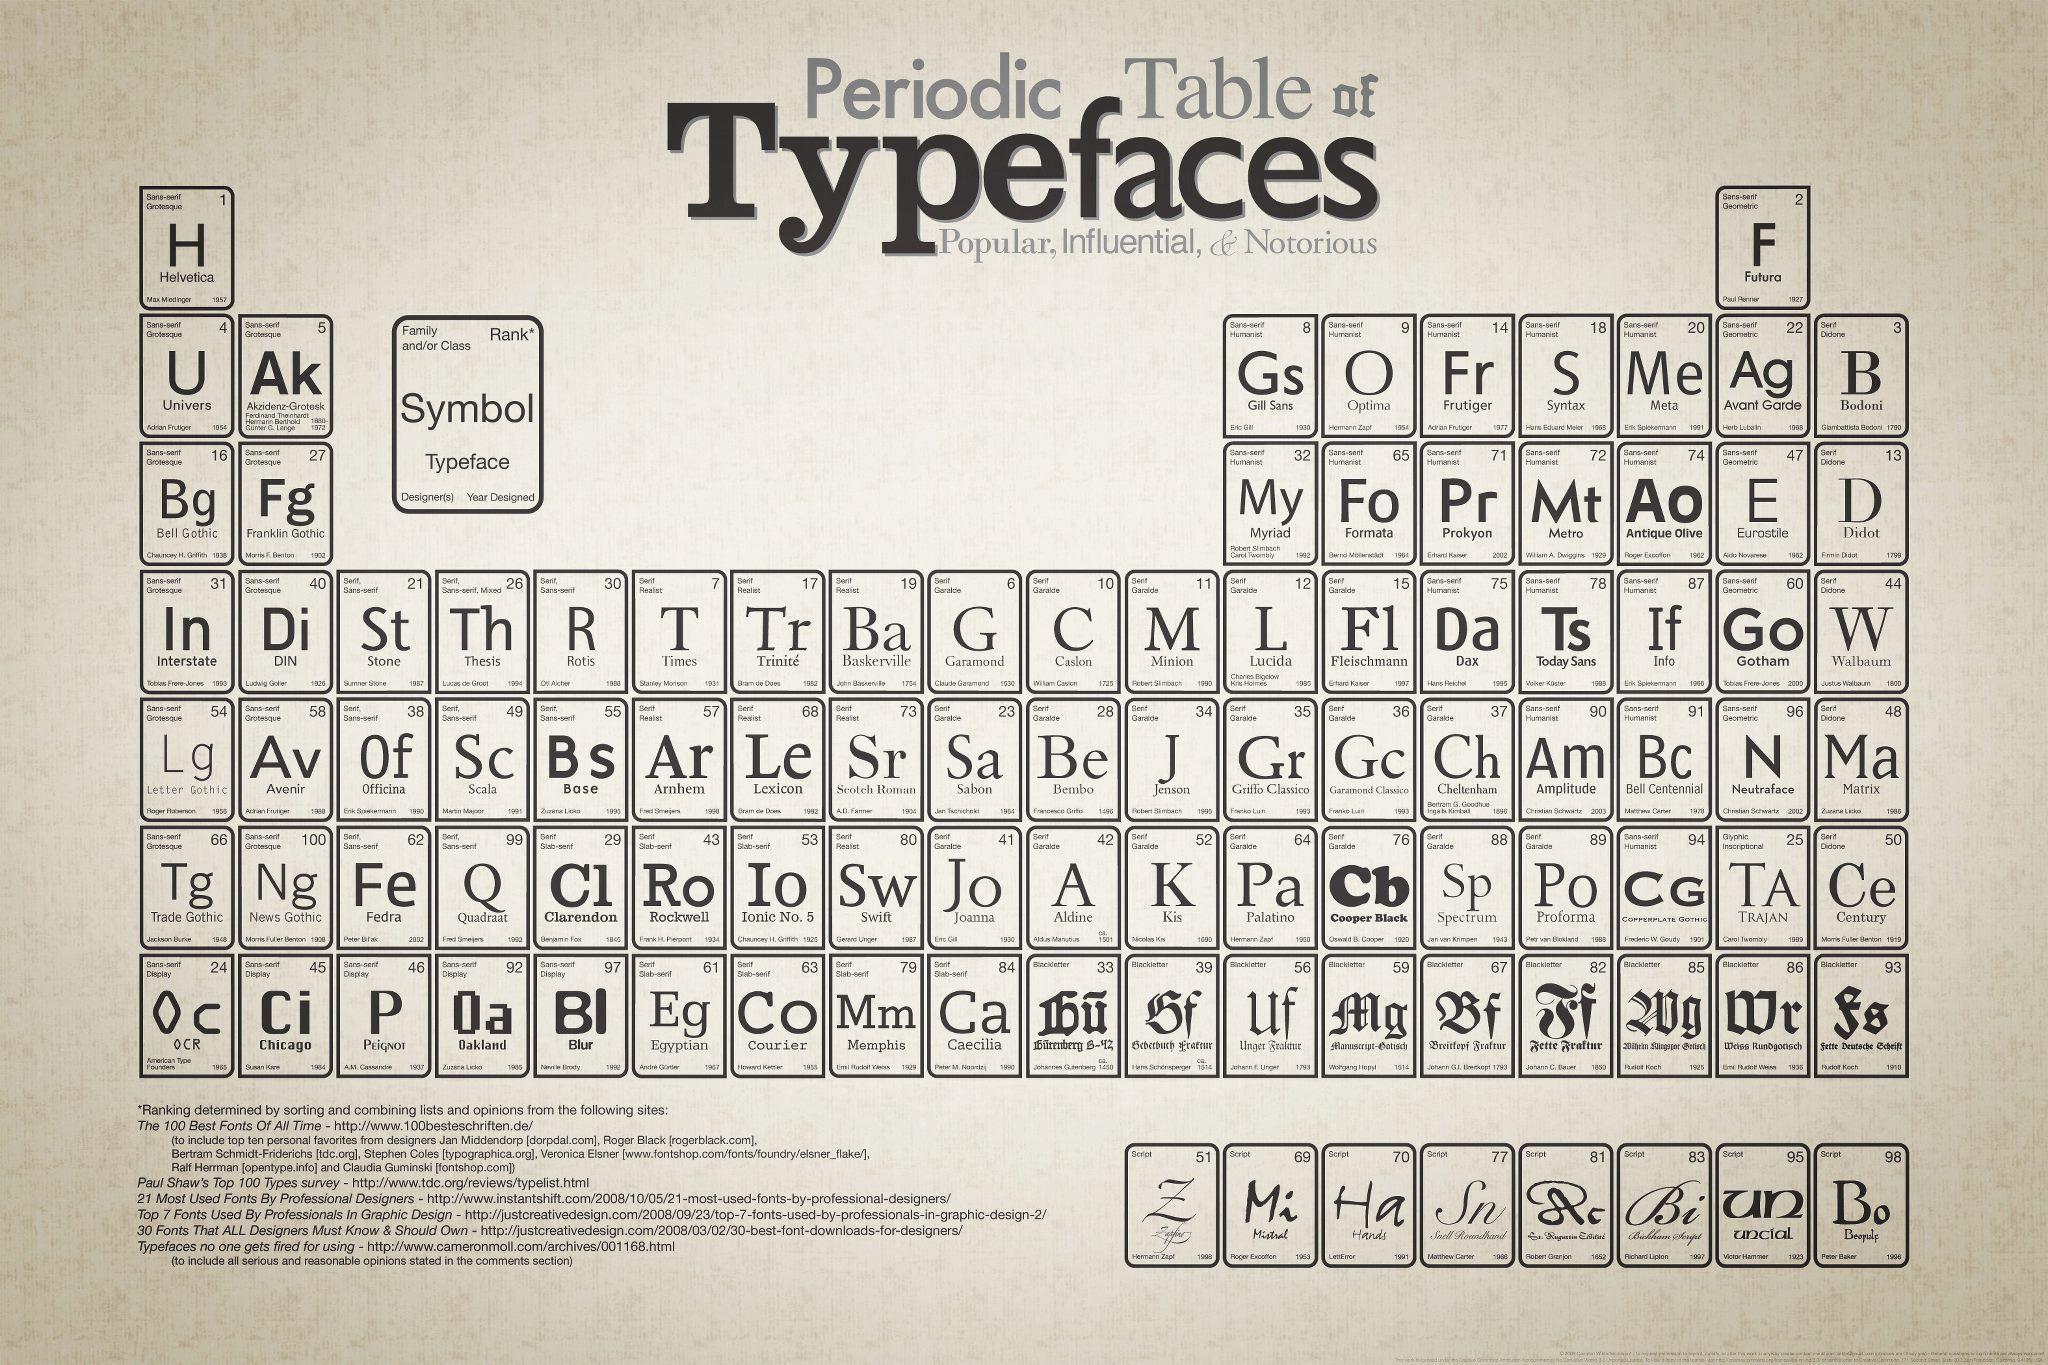 Tabla peridica tipogrfica disseny web pinterest tabla la tabla peridica tipogrfica urtaz Images